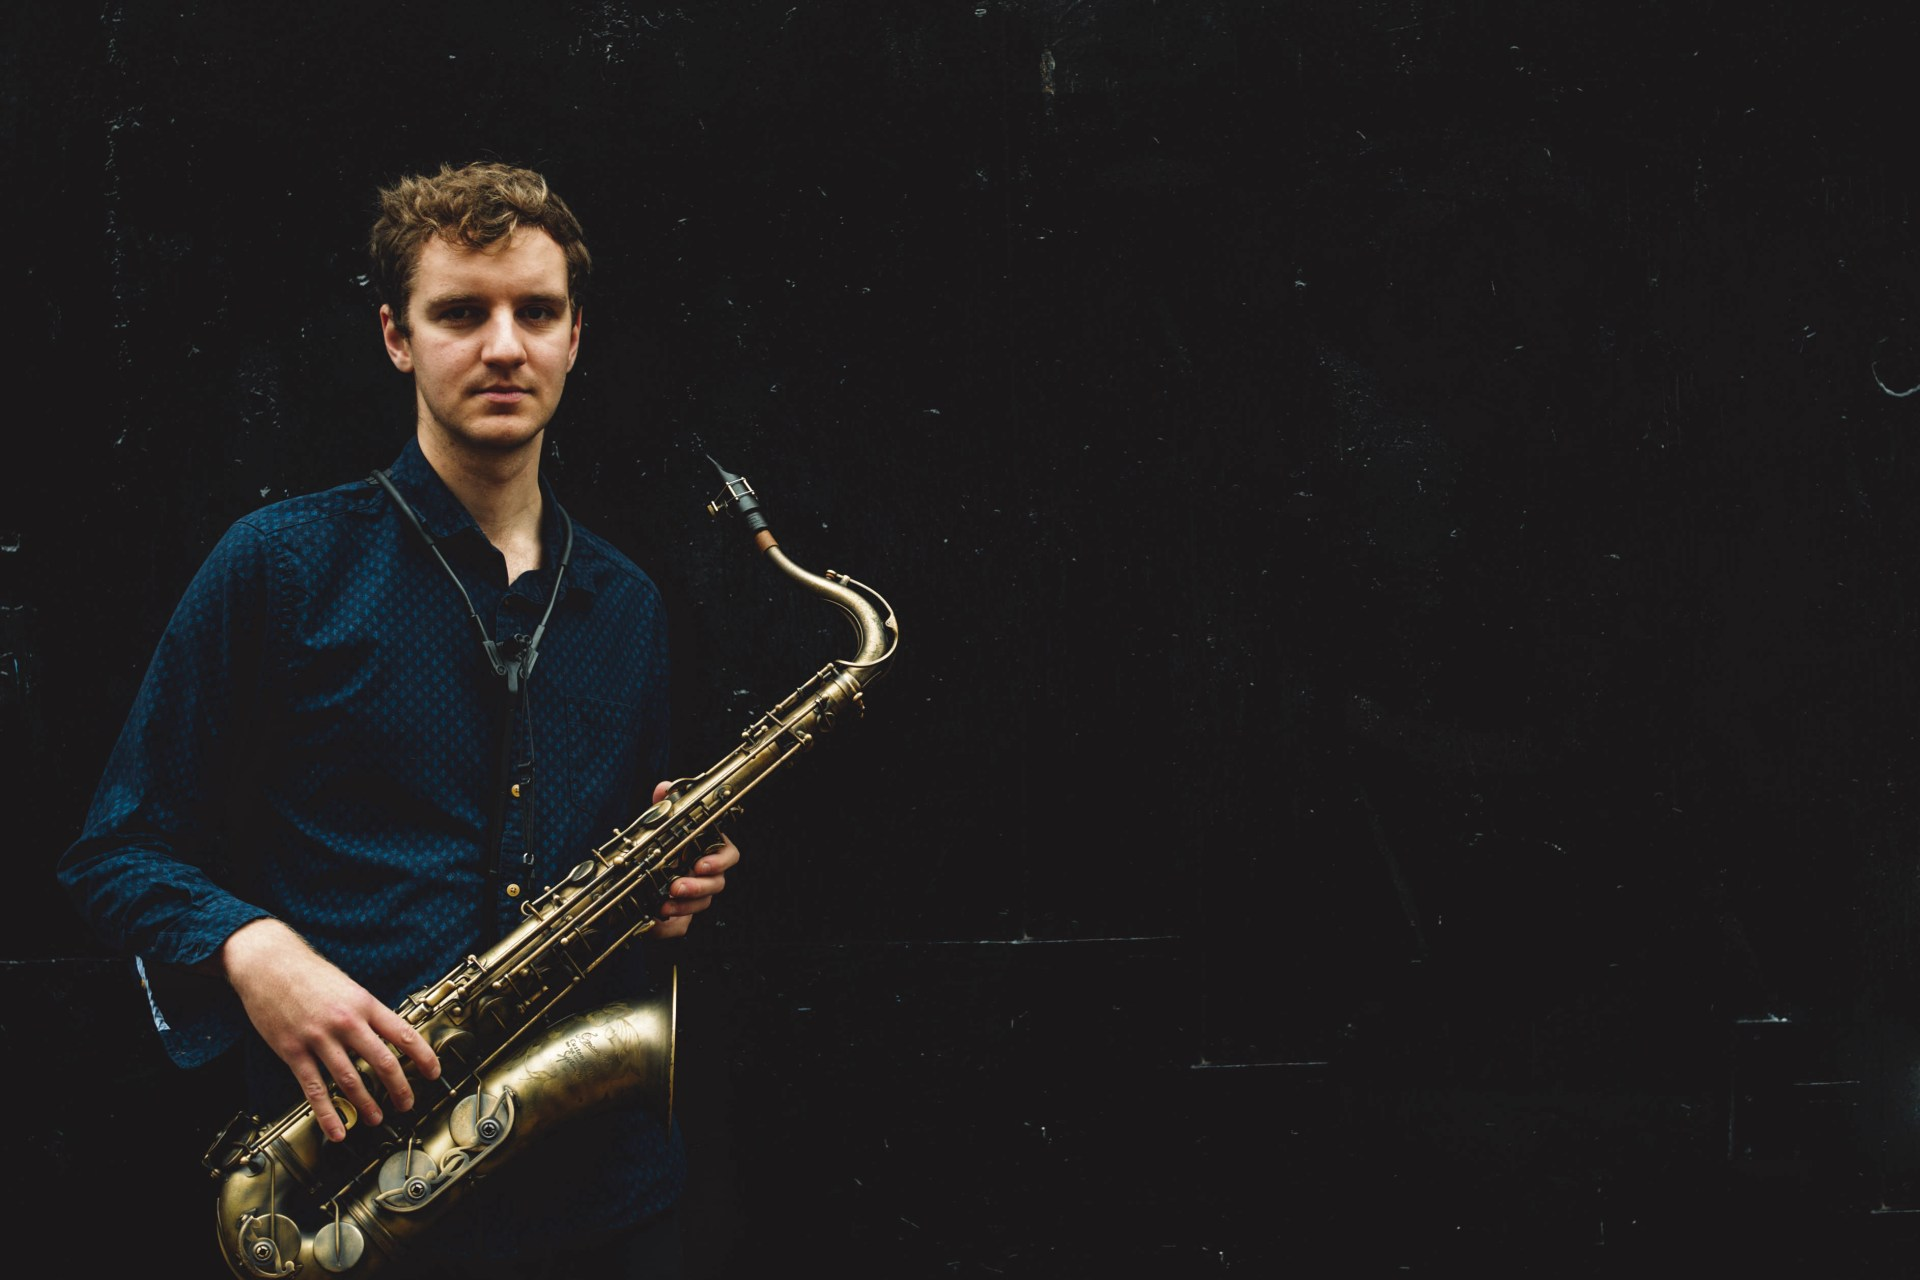 Bristol Saxophonist Releasing Debut Jazz/Neo Soul Single